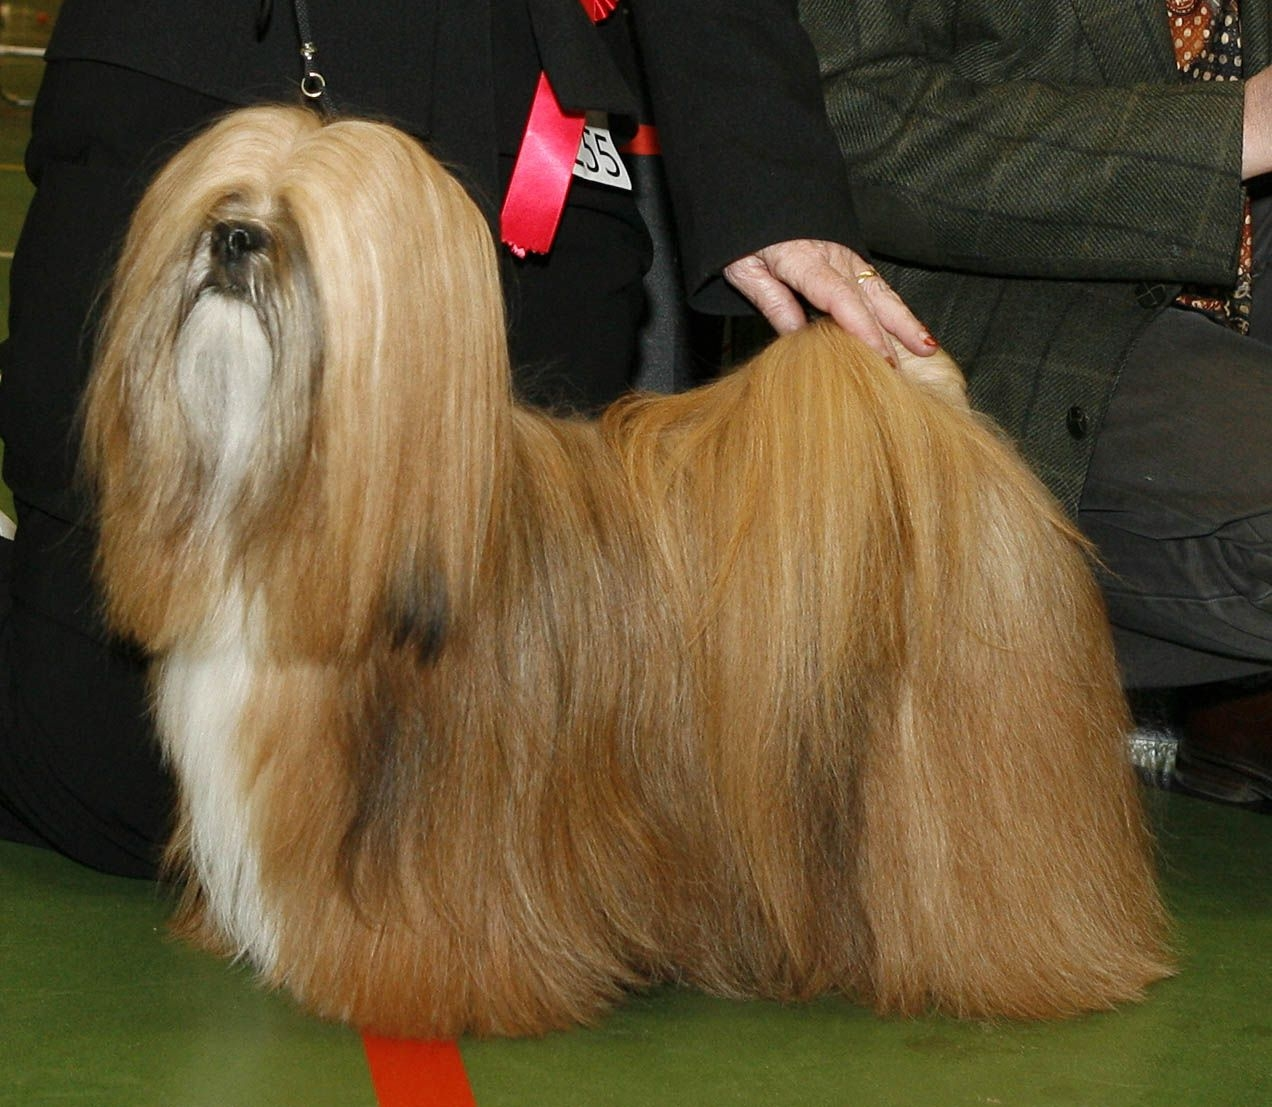 Image result for hondenras show extreem veel haar